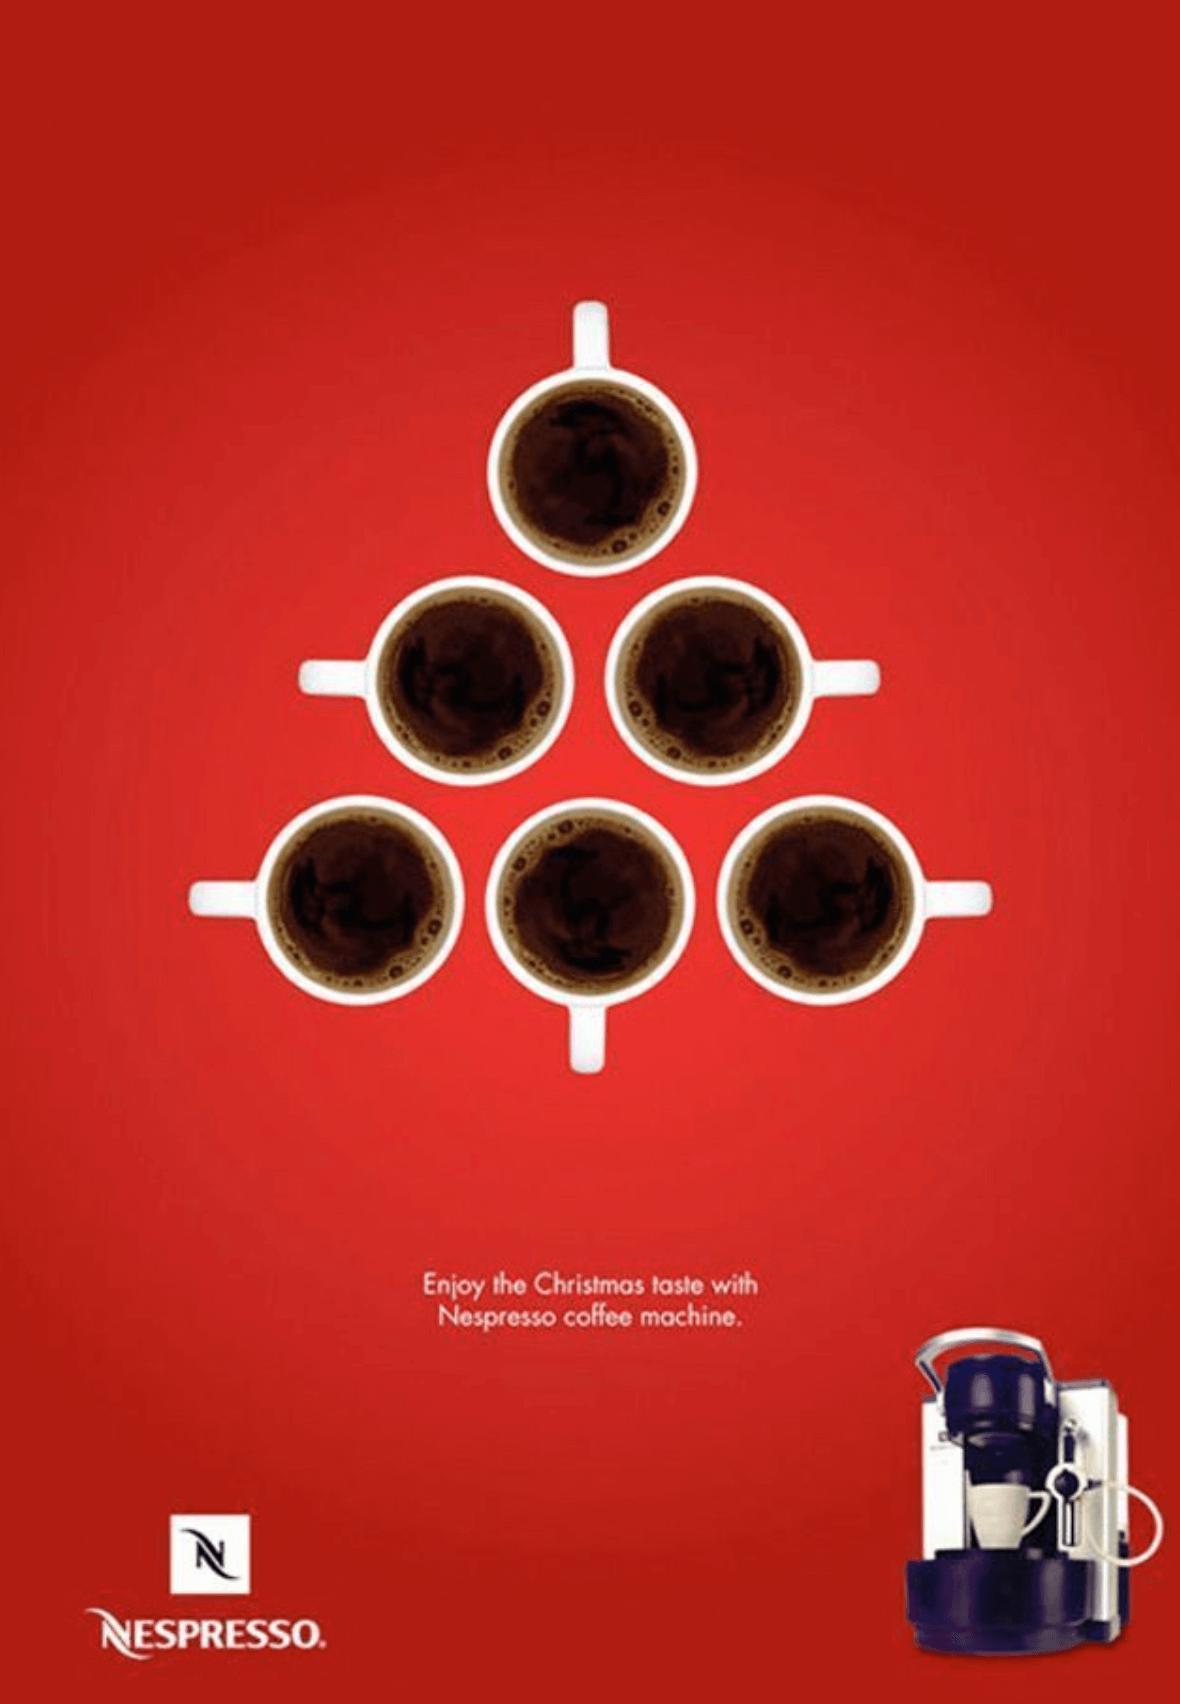 Nespresso campaña navideña